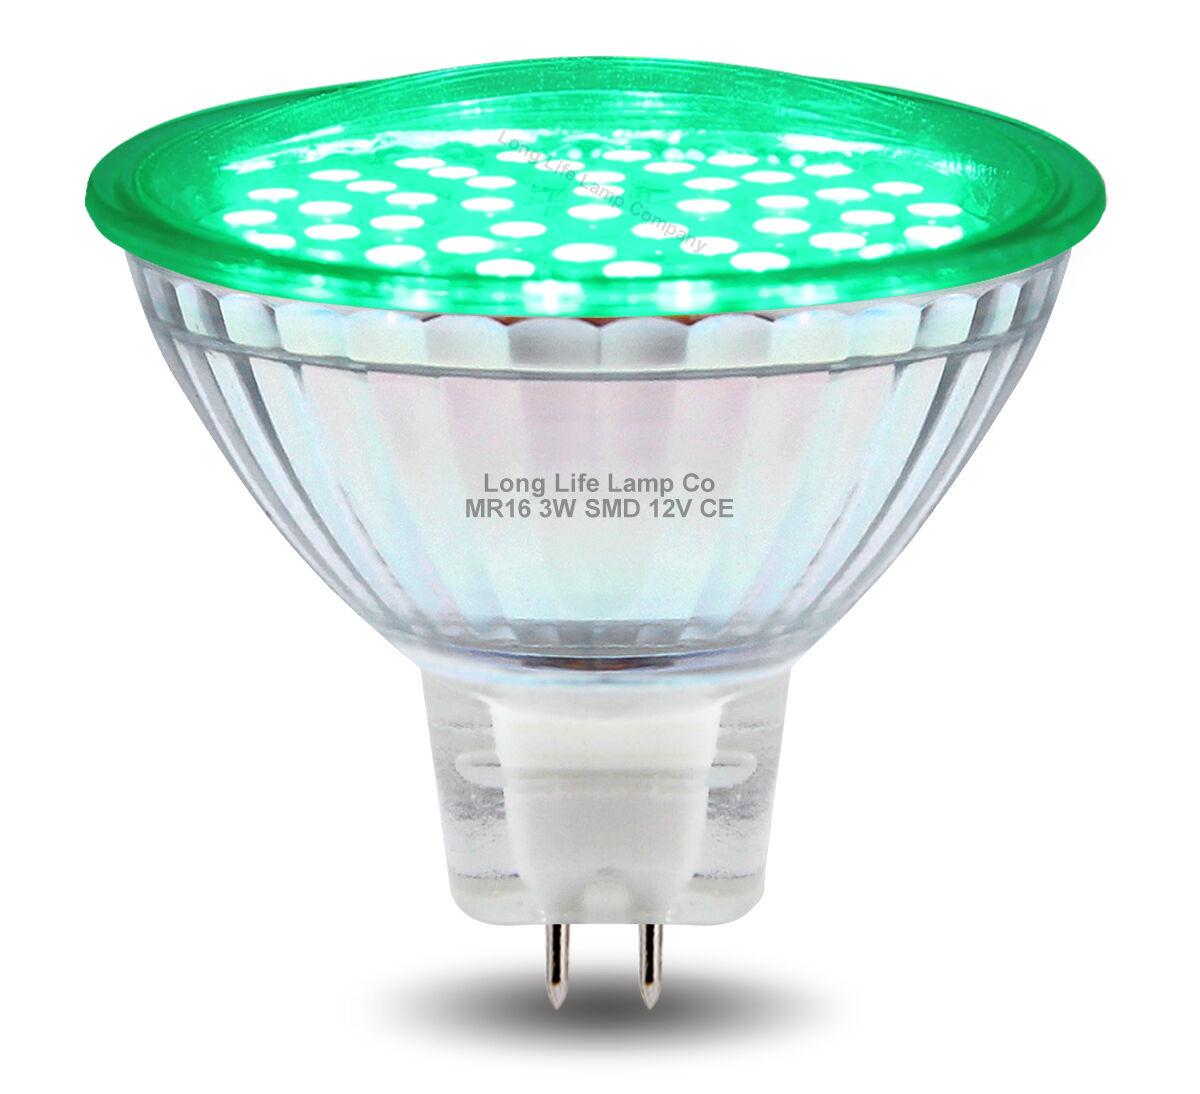 RED GREEN BLUE Yellow 12V LED MR16 Low Voltage Light Bulb GU5.3 ...